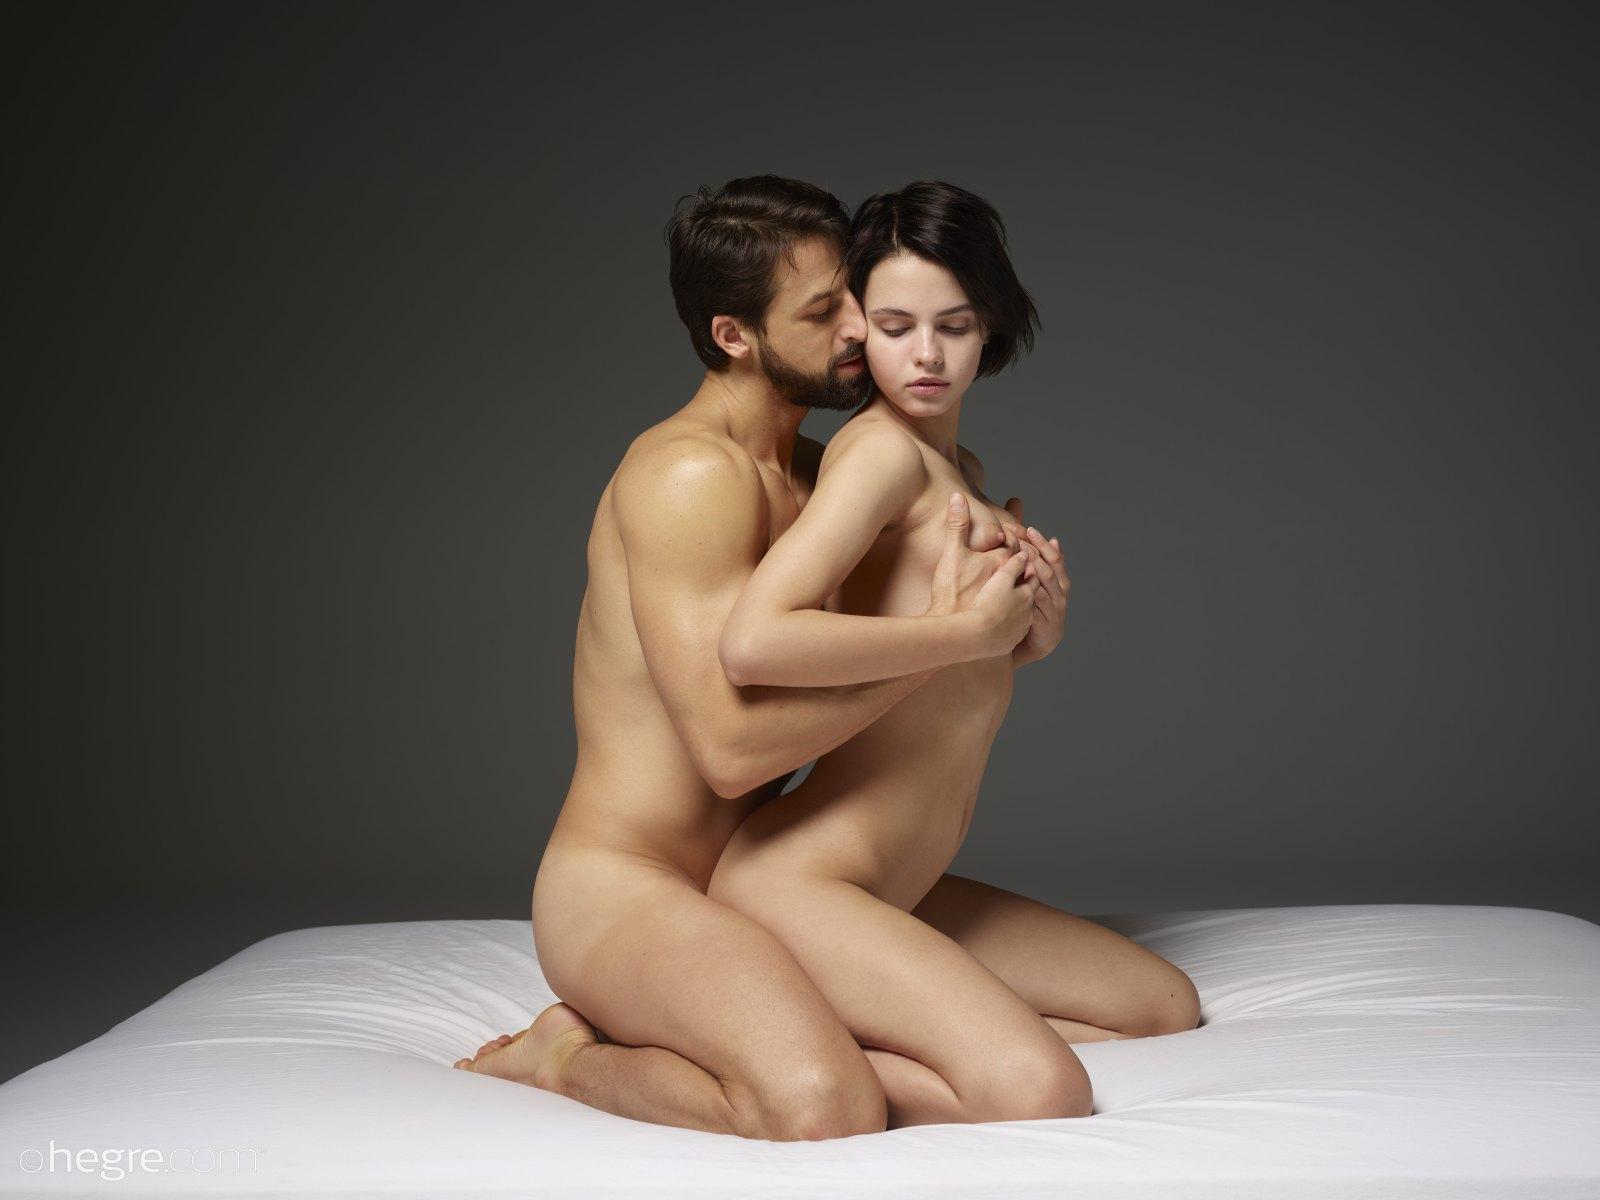 Full Figure Women Having Wild Sex Couple